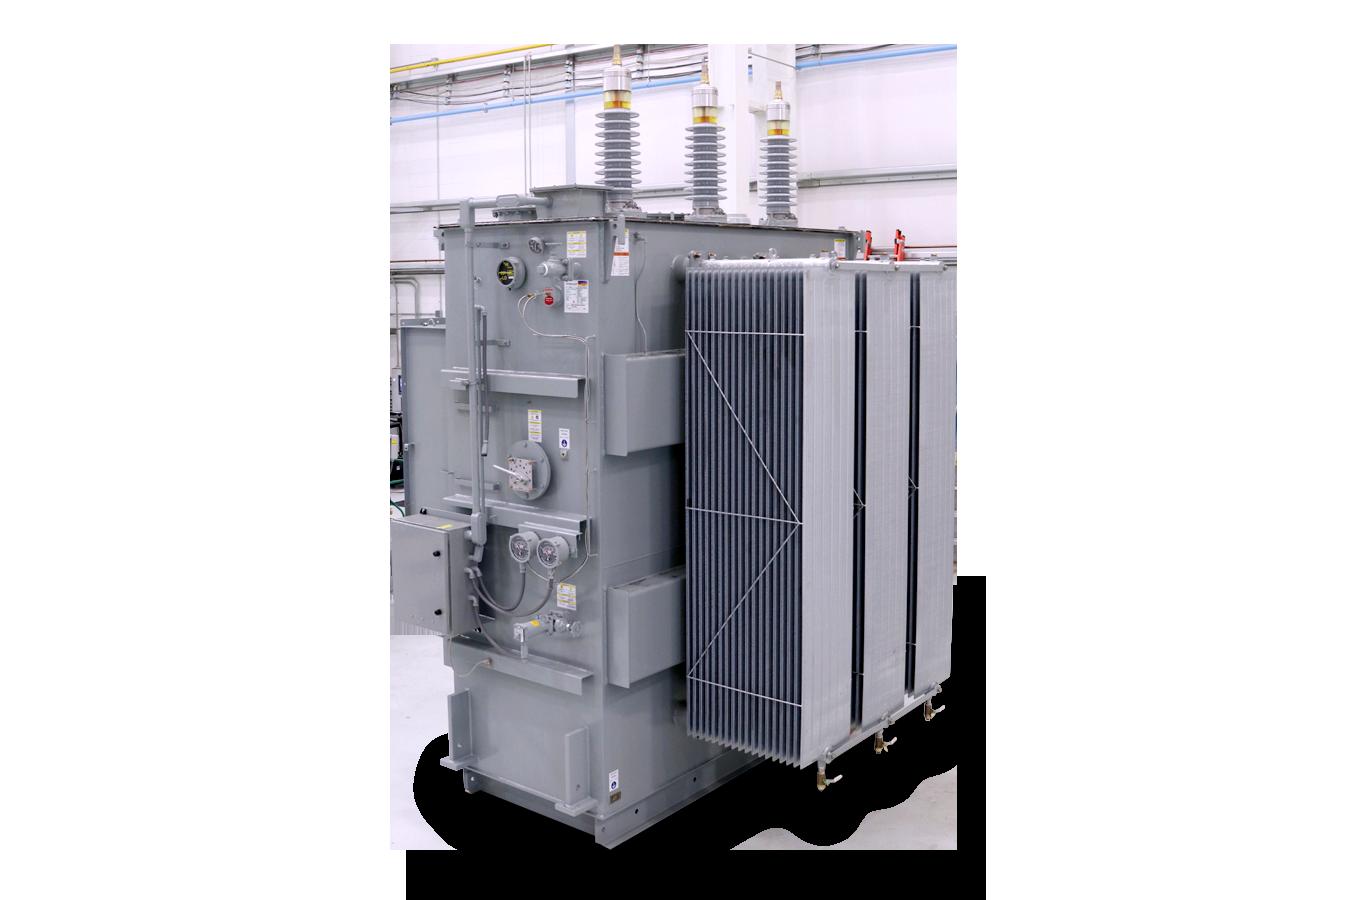 Static Frequency Converter Transformers - Niagara Transformer